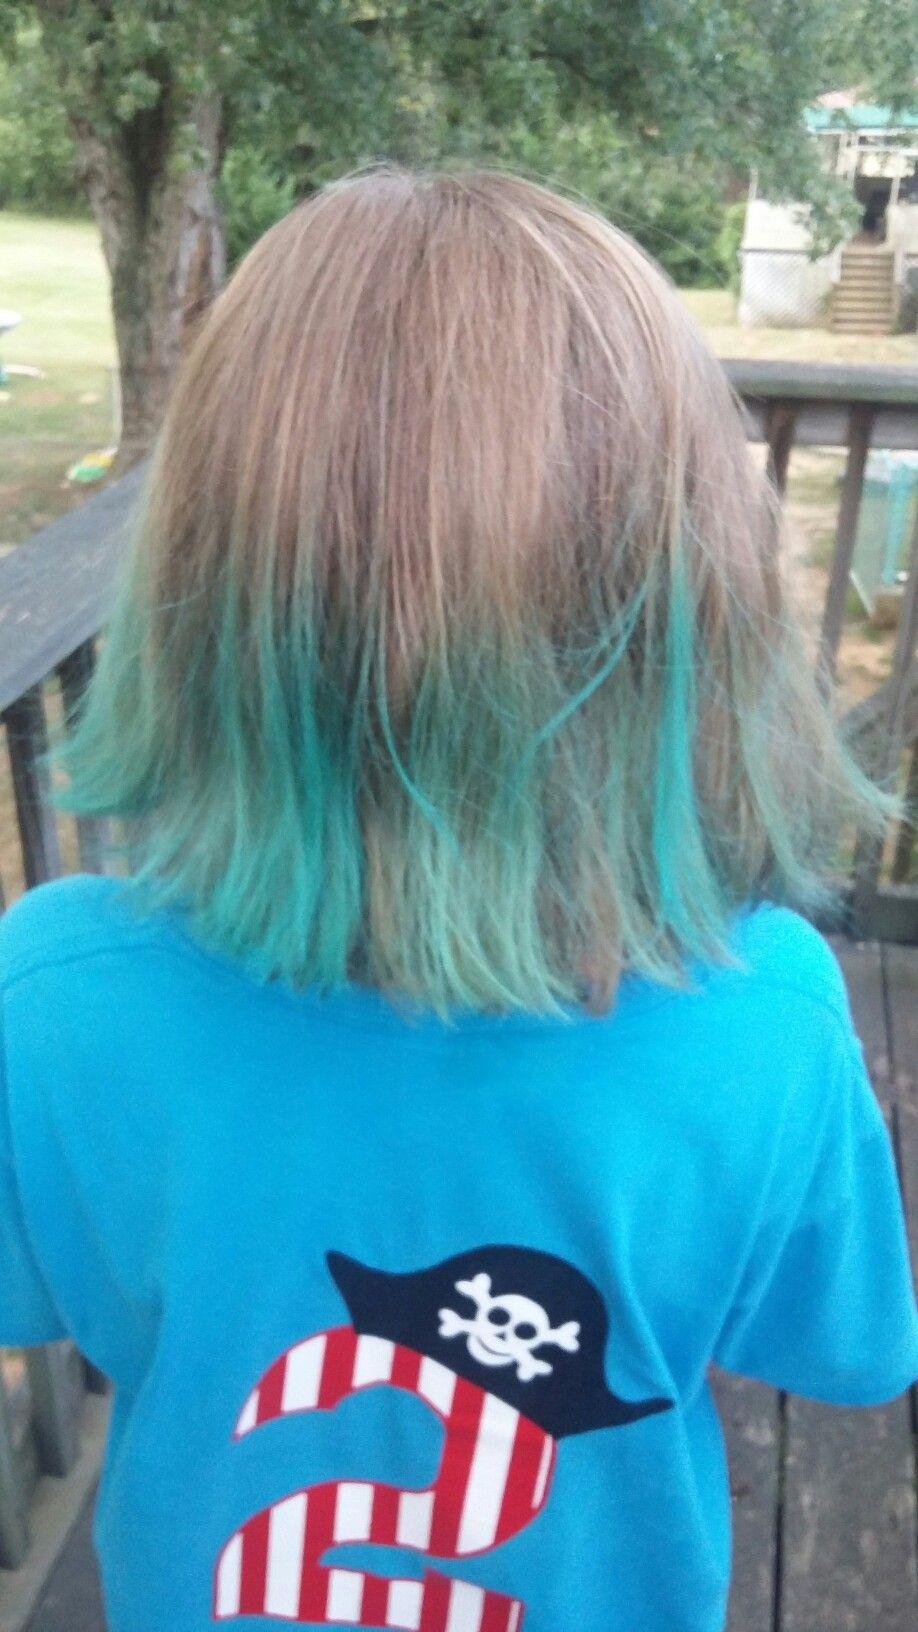 used kool-aid to dye her hair. She loves it